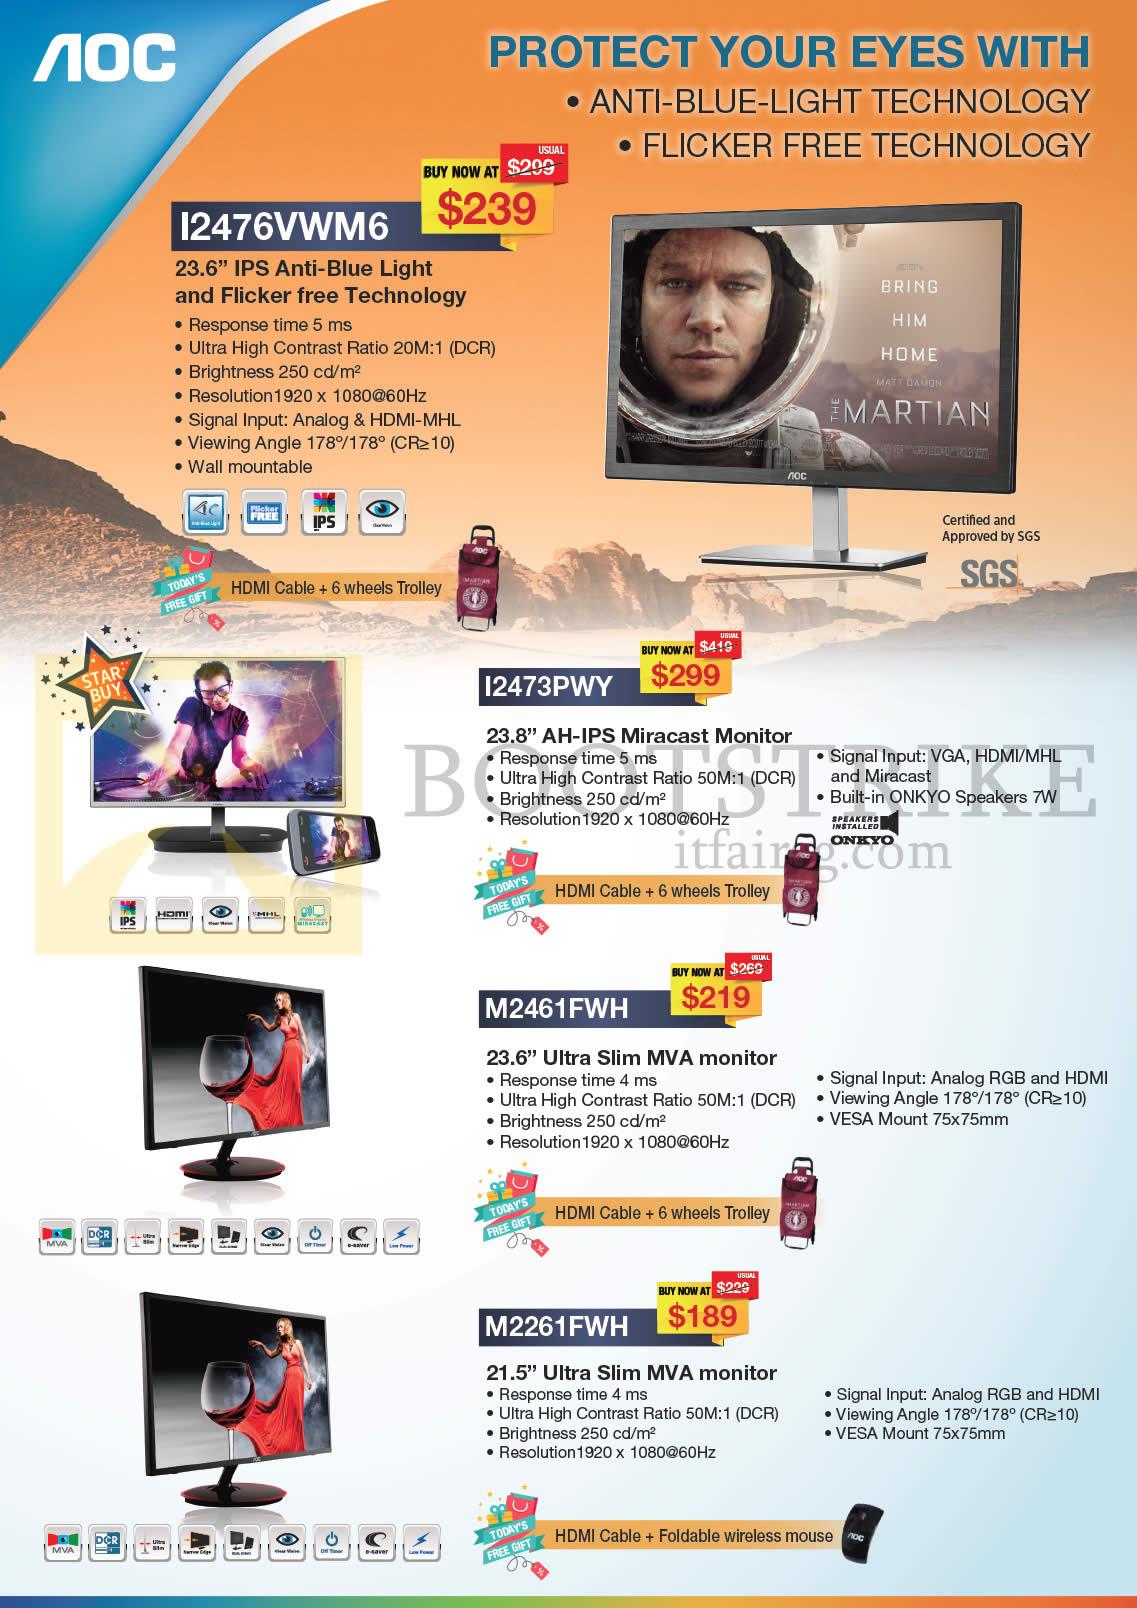 SITEX 2015 price list image brochure of Philips AOC Monitor I2476VWM6, I2473PWY, M2461FWH, M2261FWH